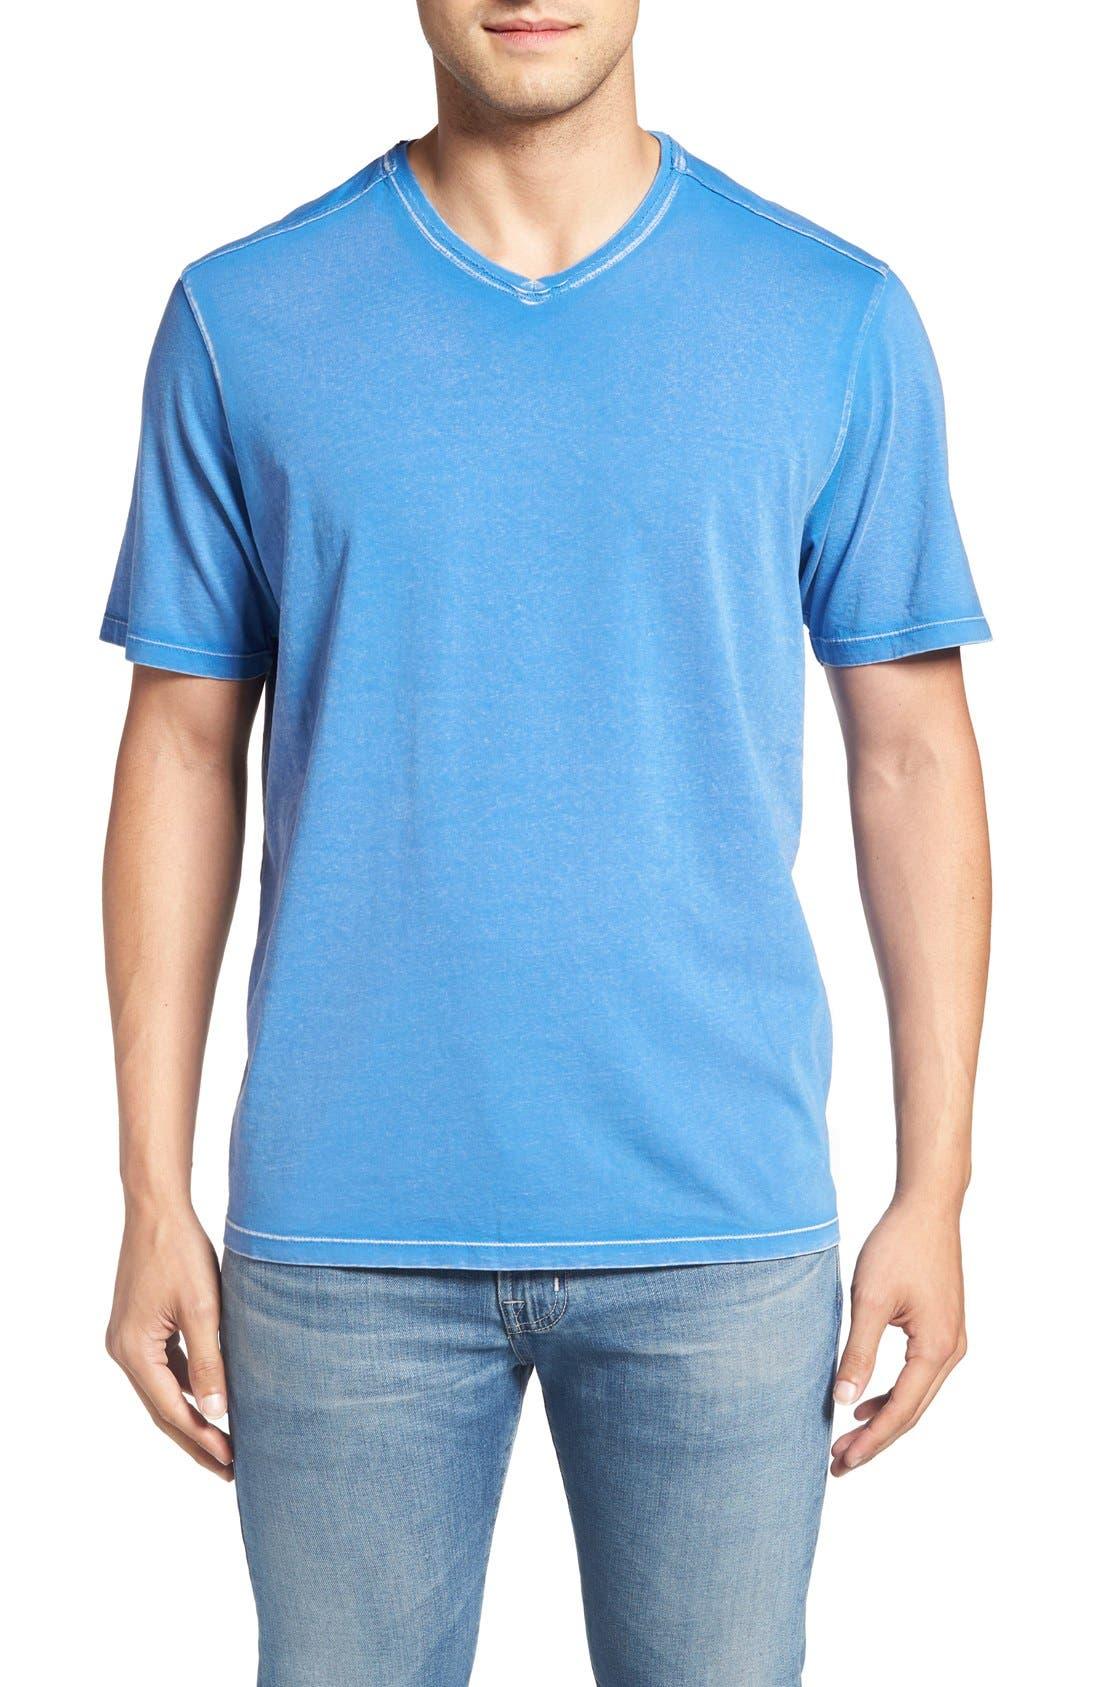 Main Image - Tommy Bahama 'Kahuna' V-Neck T-Shirt